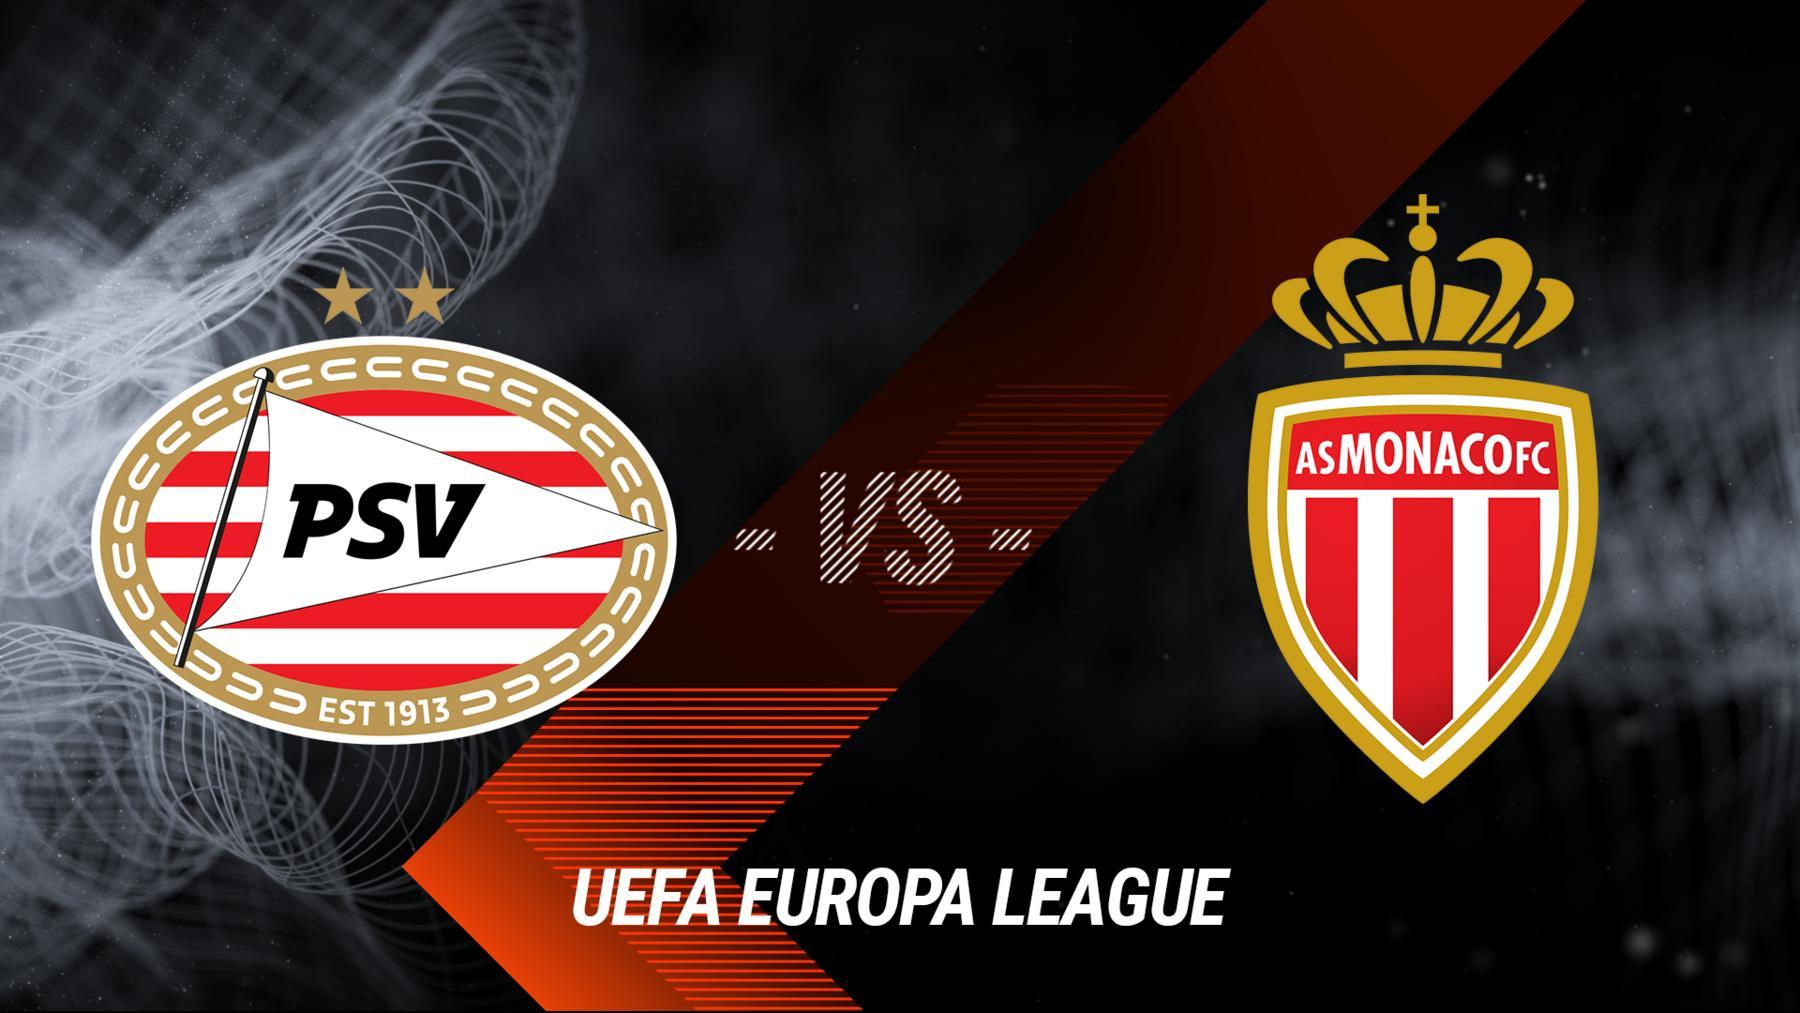 PSV Eindhoven - AS Monaco